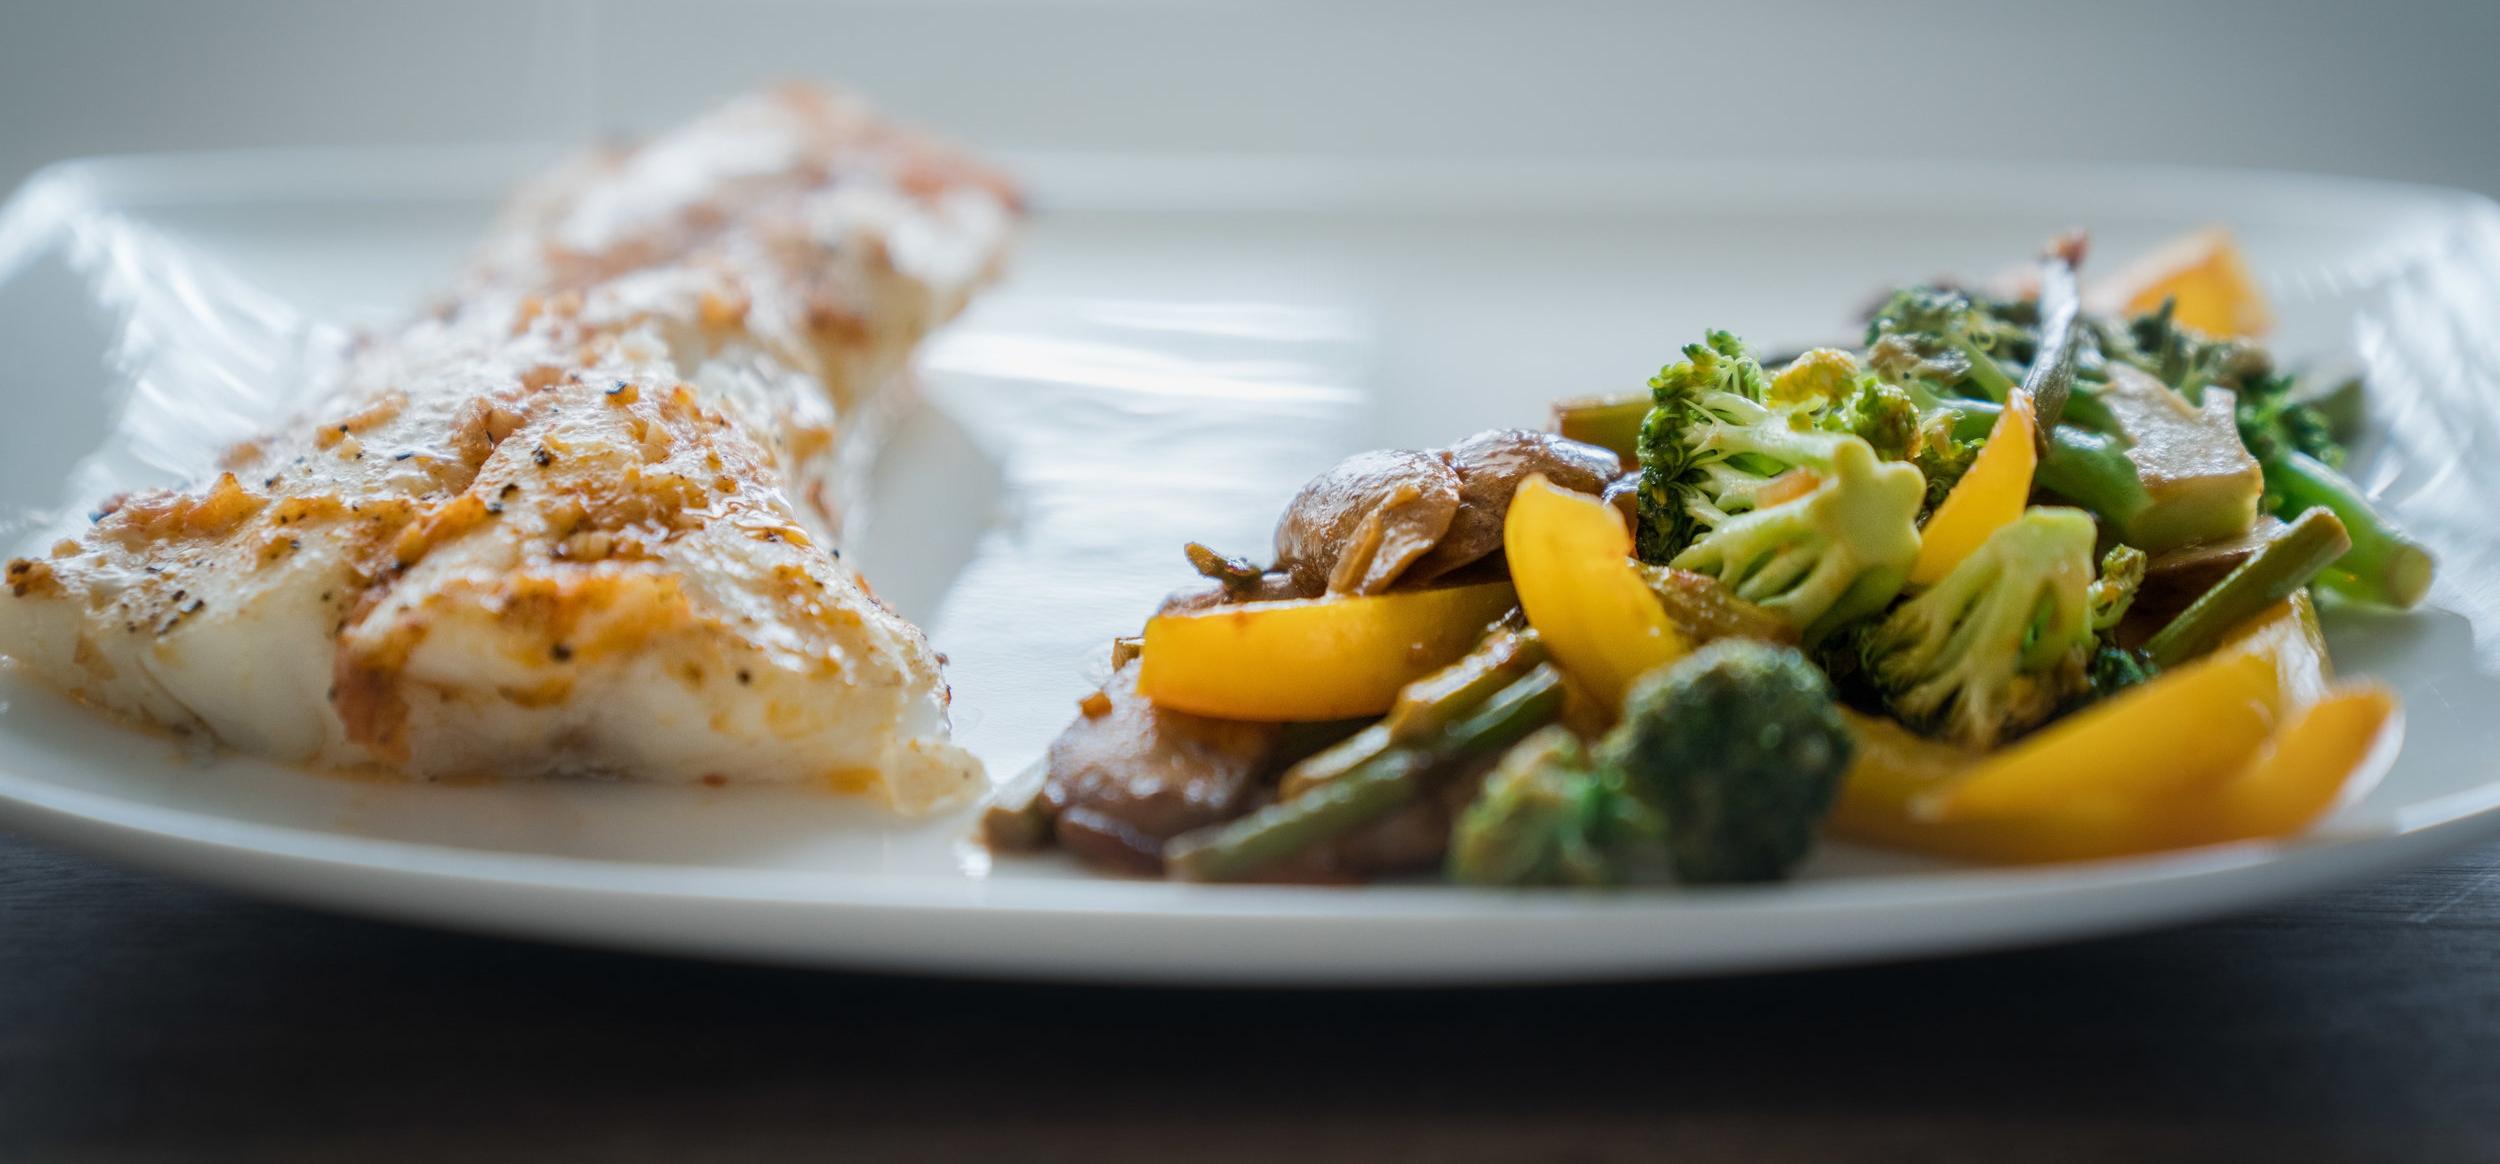 Haddock and Stir-fry recipe via micahdeyoung.com